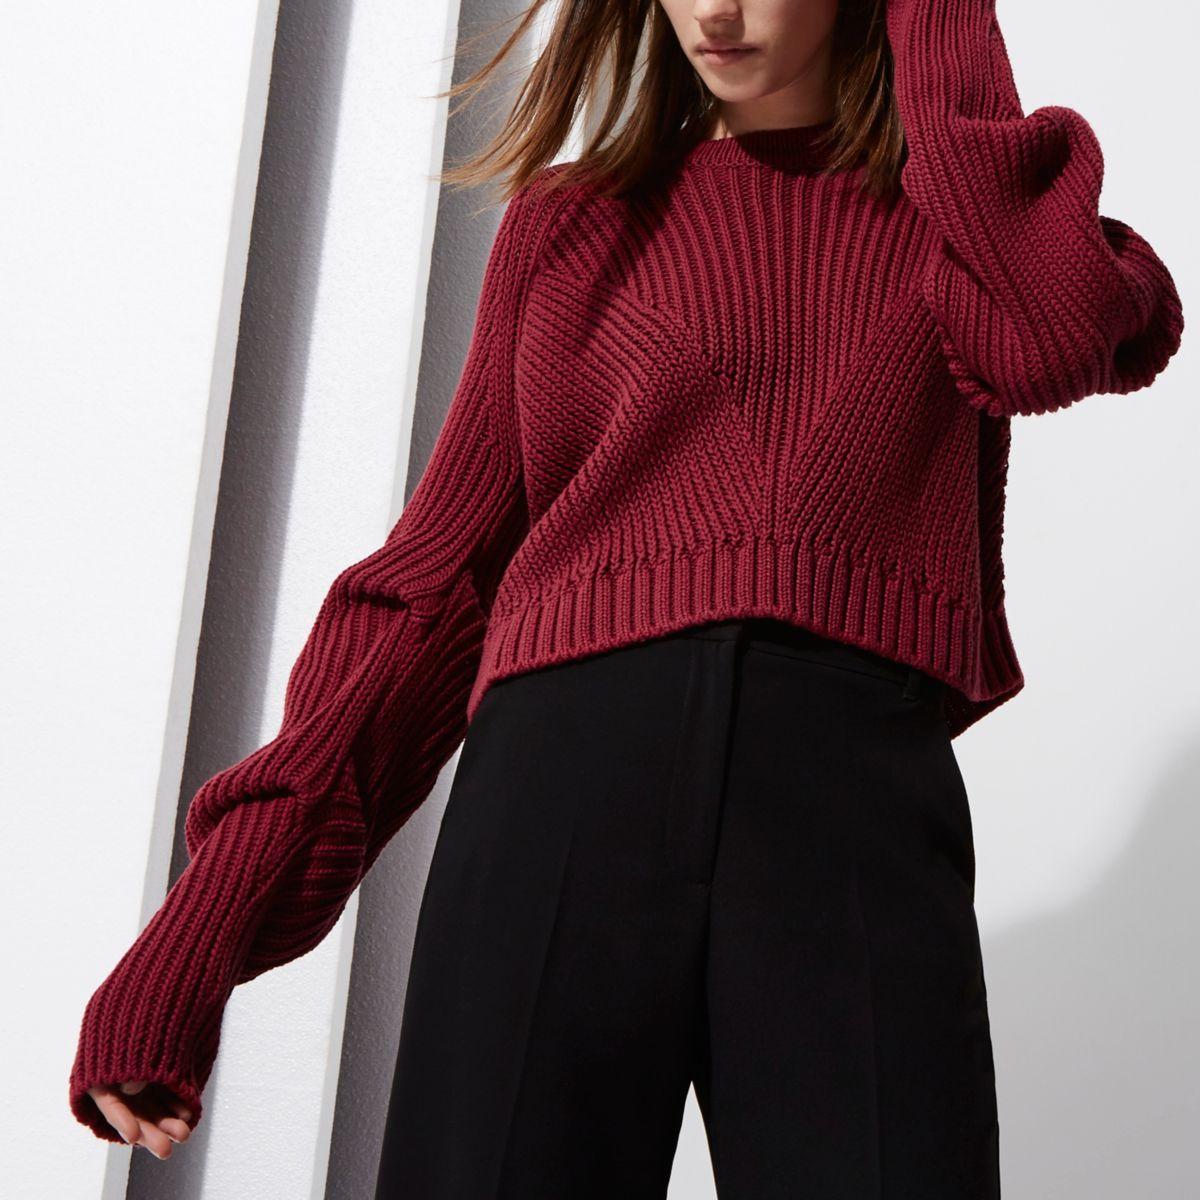 Berry RI Studio rib knit ruched sleeve sweater